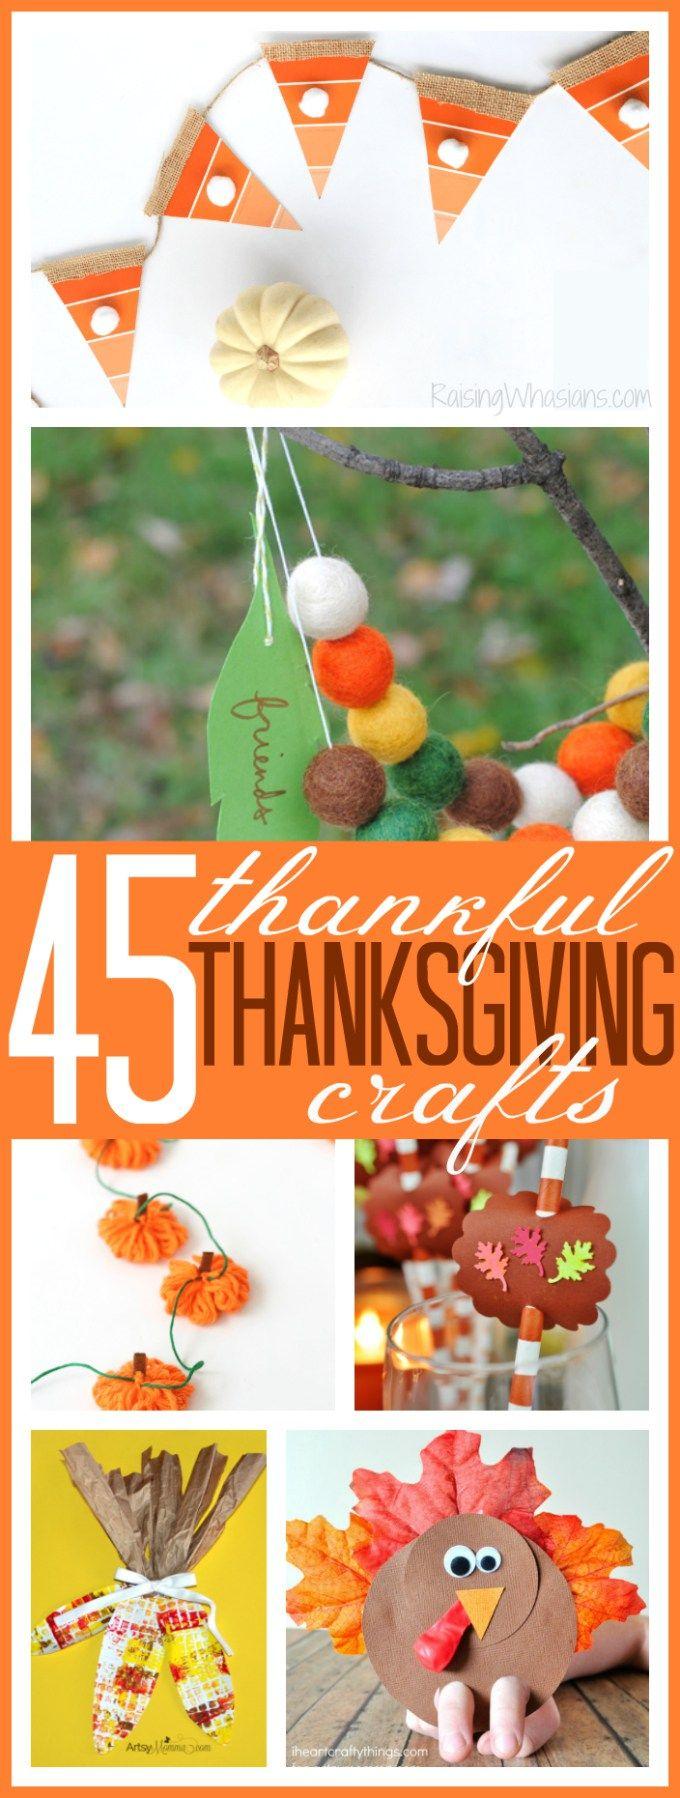 45 Thankful Thanksgiving Crafts fo Kids - Raising Whasians